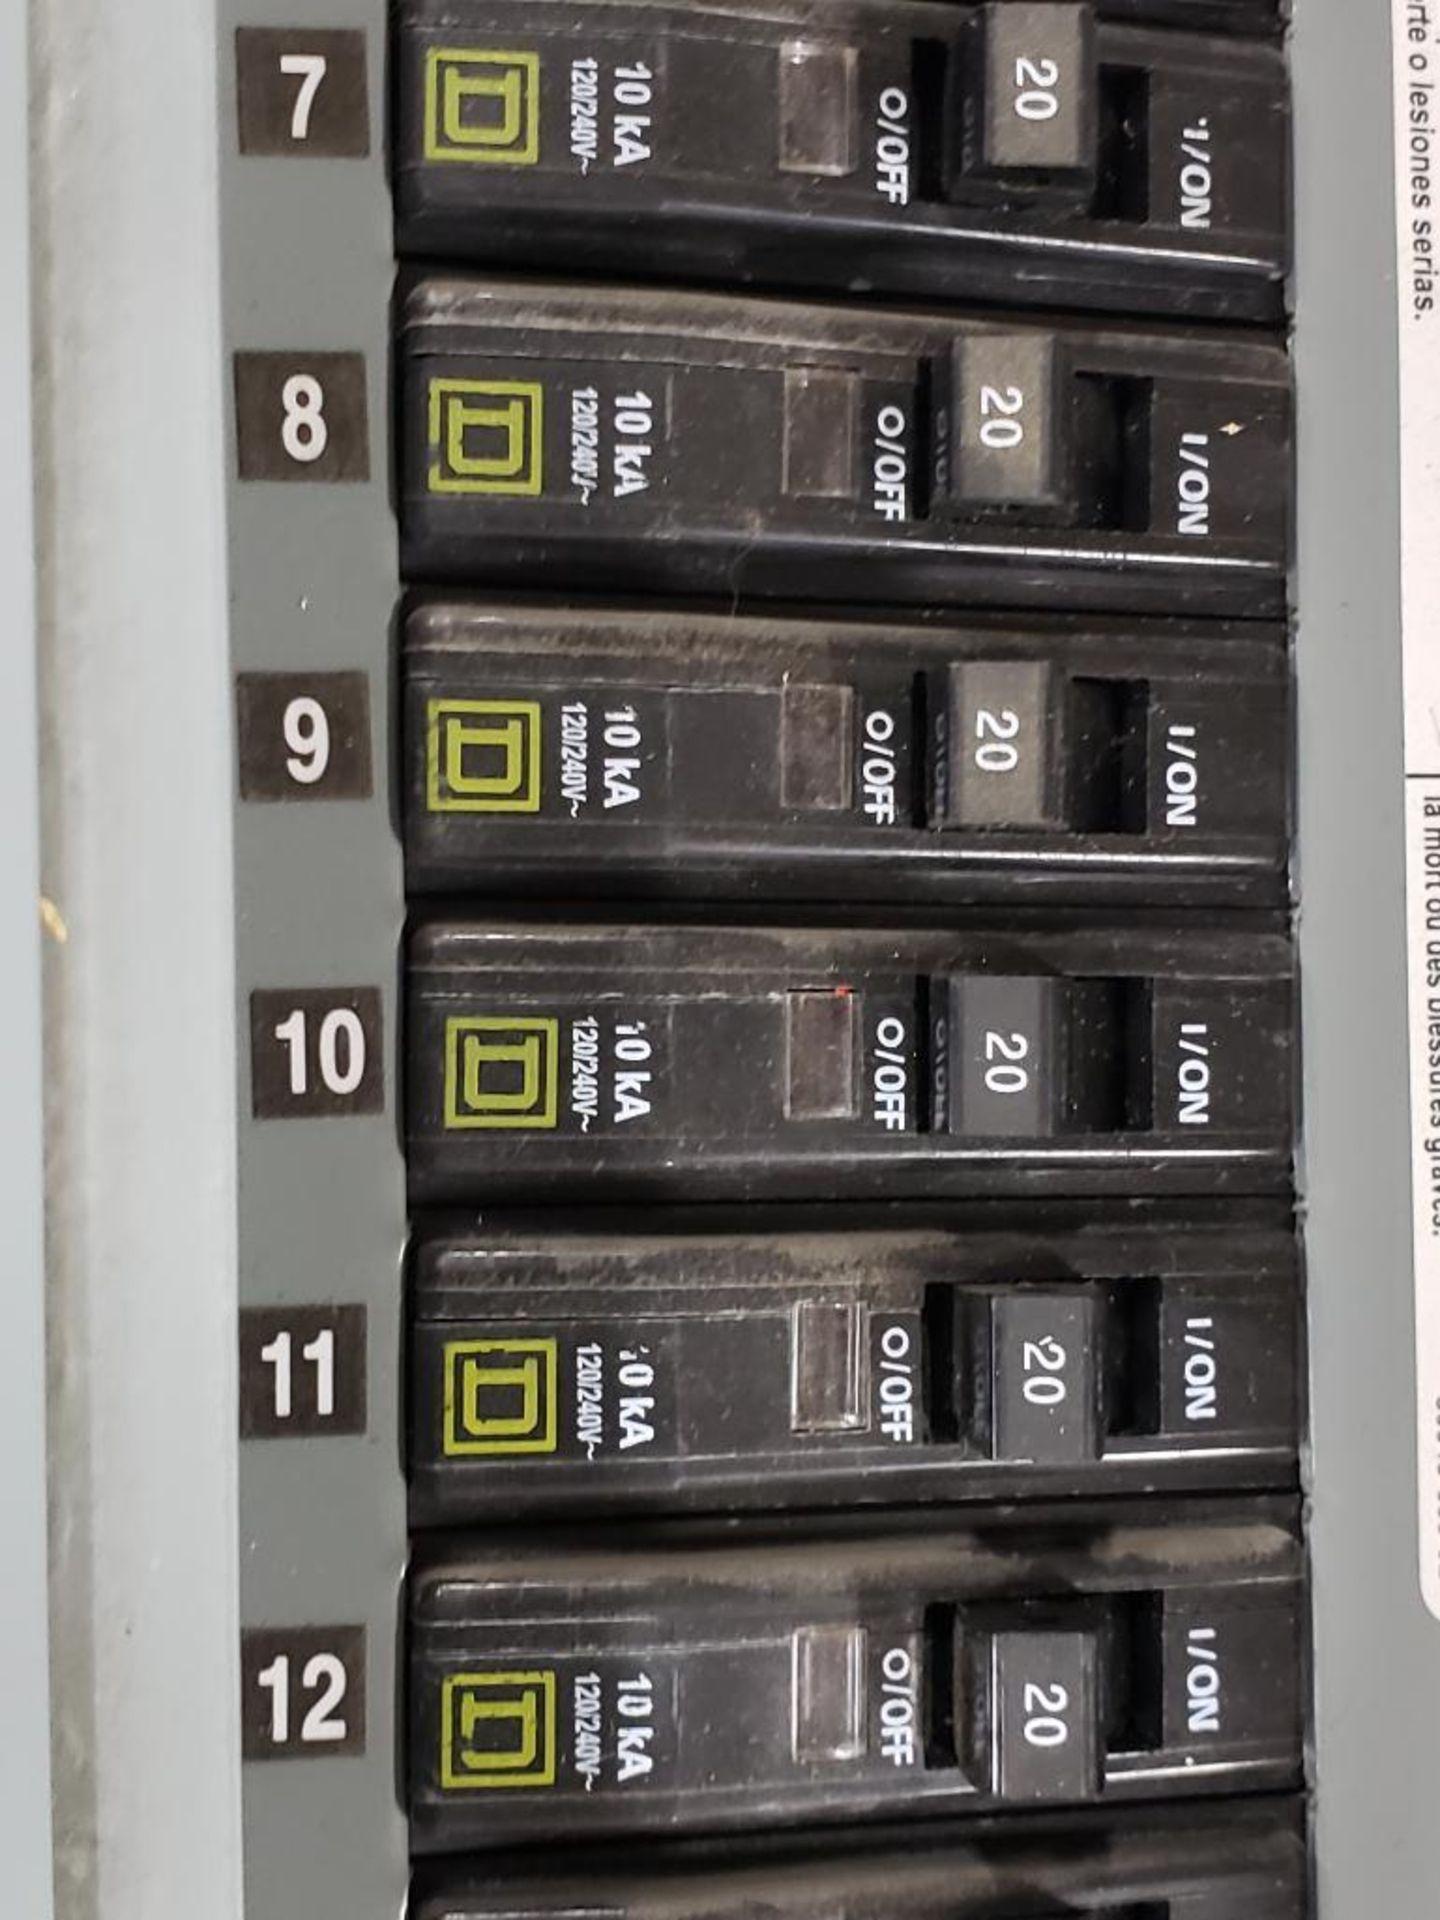 Square-D LX62TS Type-1 Enclosure. - Image 5 of 14